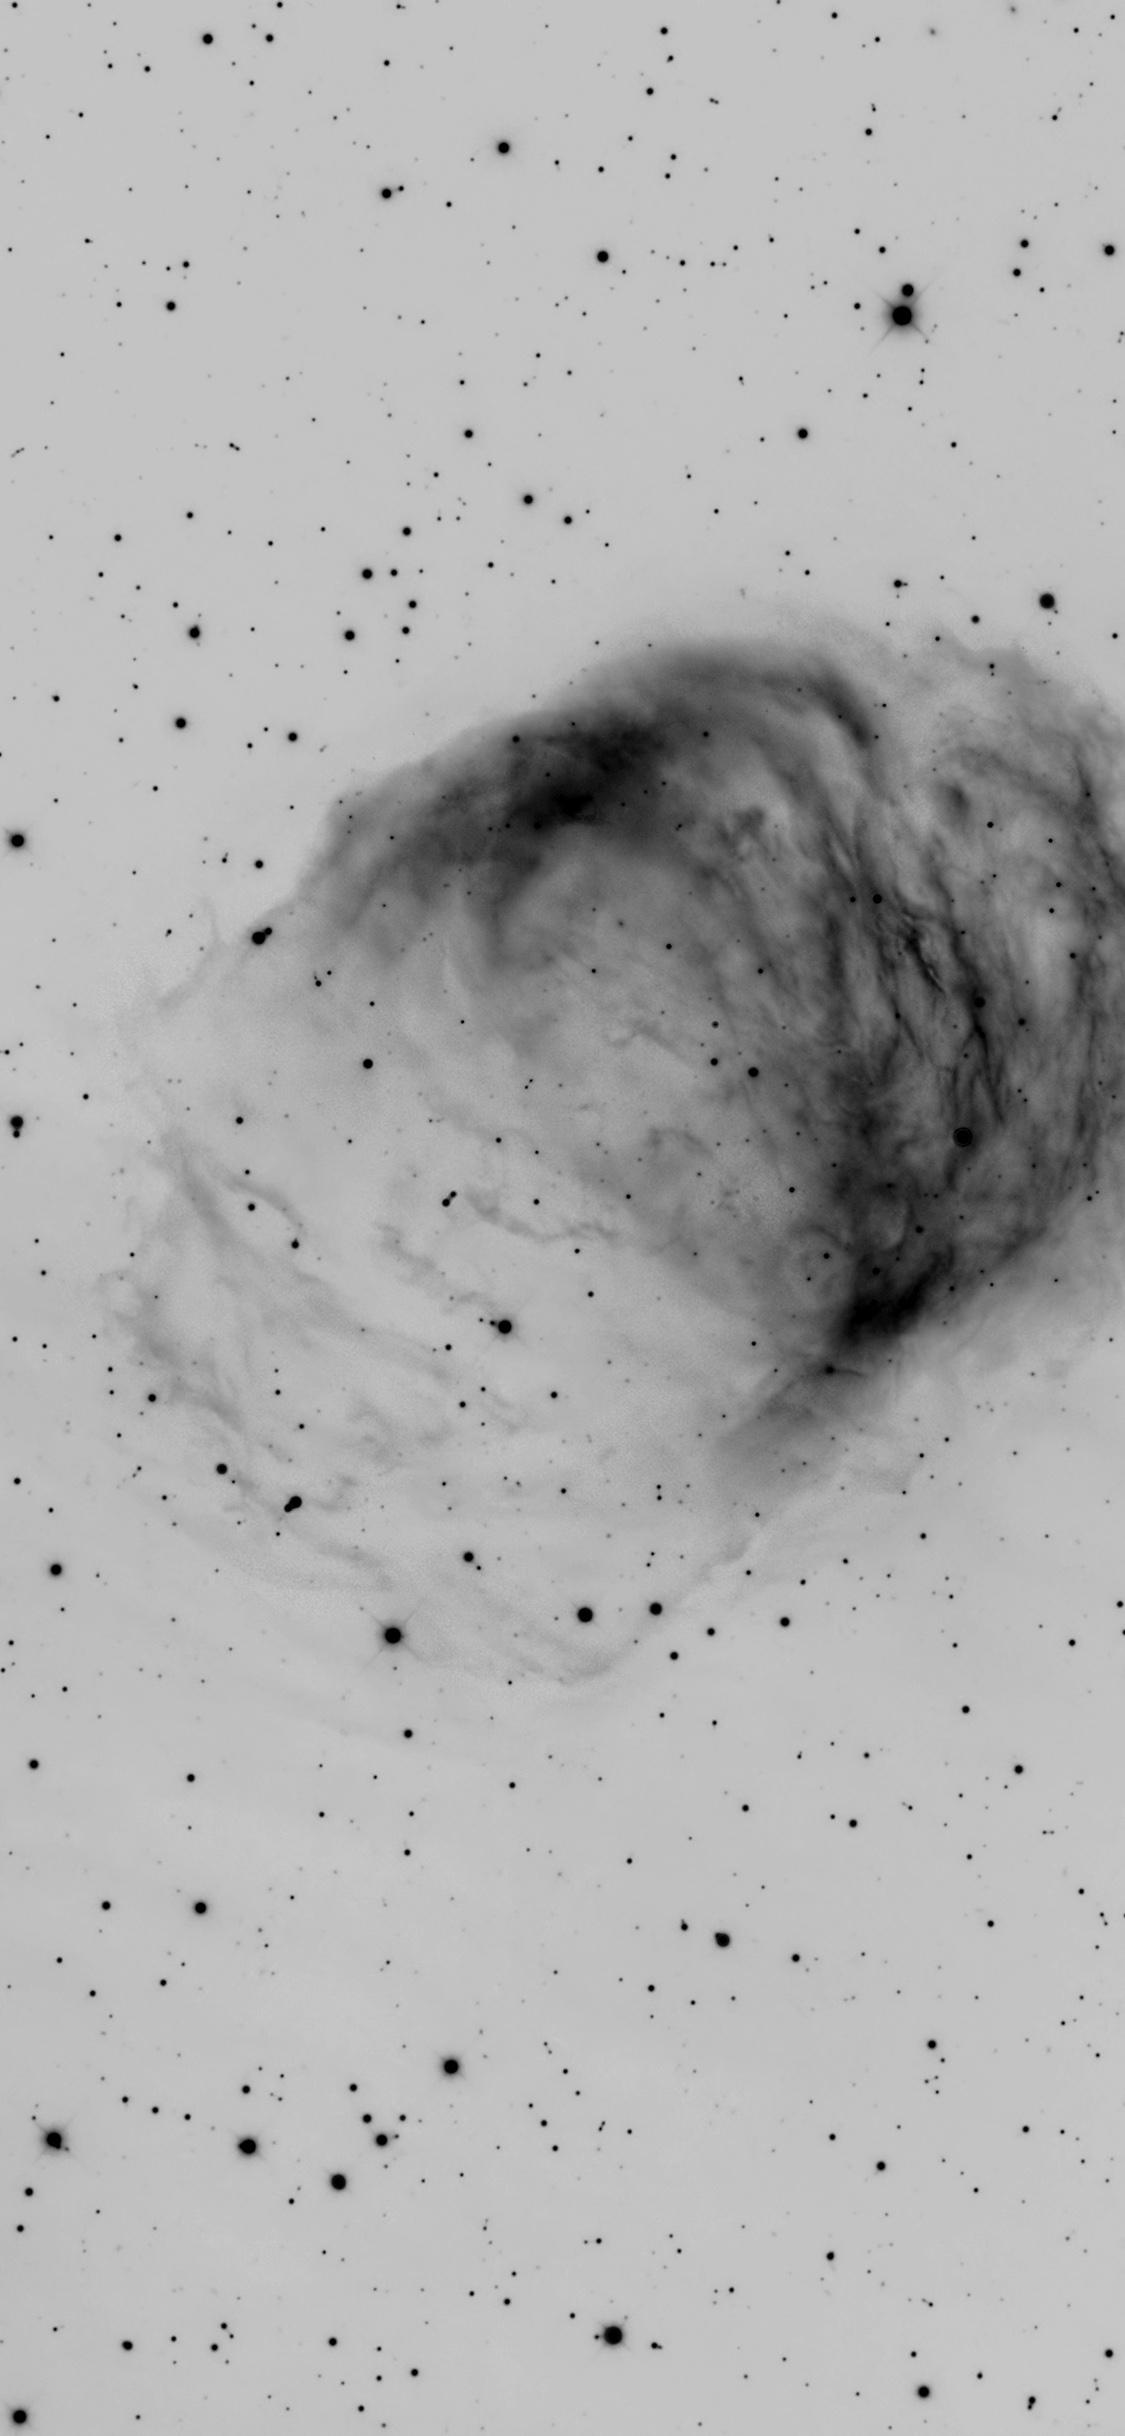 iPhonexpapers.com-Apple-iPhone-wallpaper-mu37-space-medusa-crawford-galaxy-star-white-bw